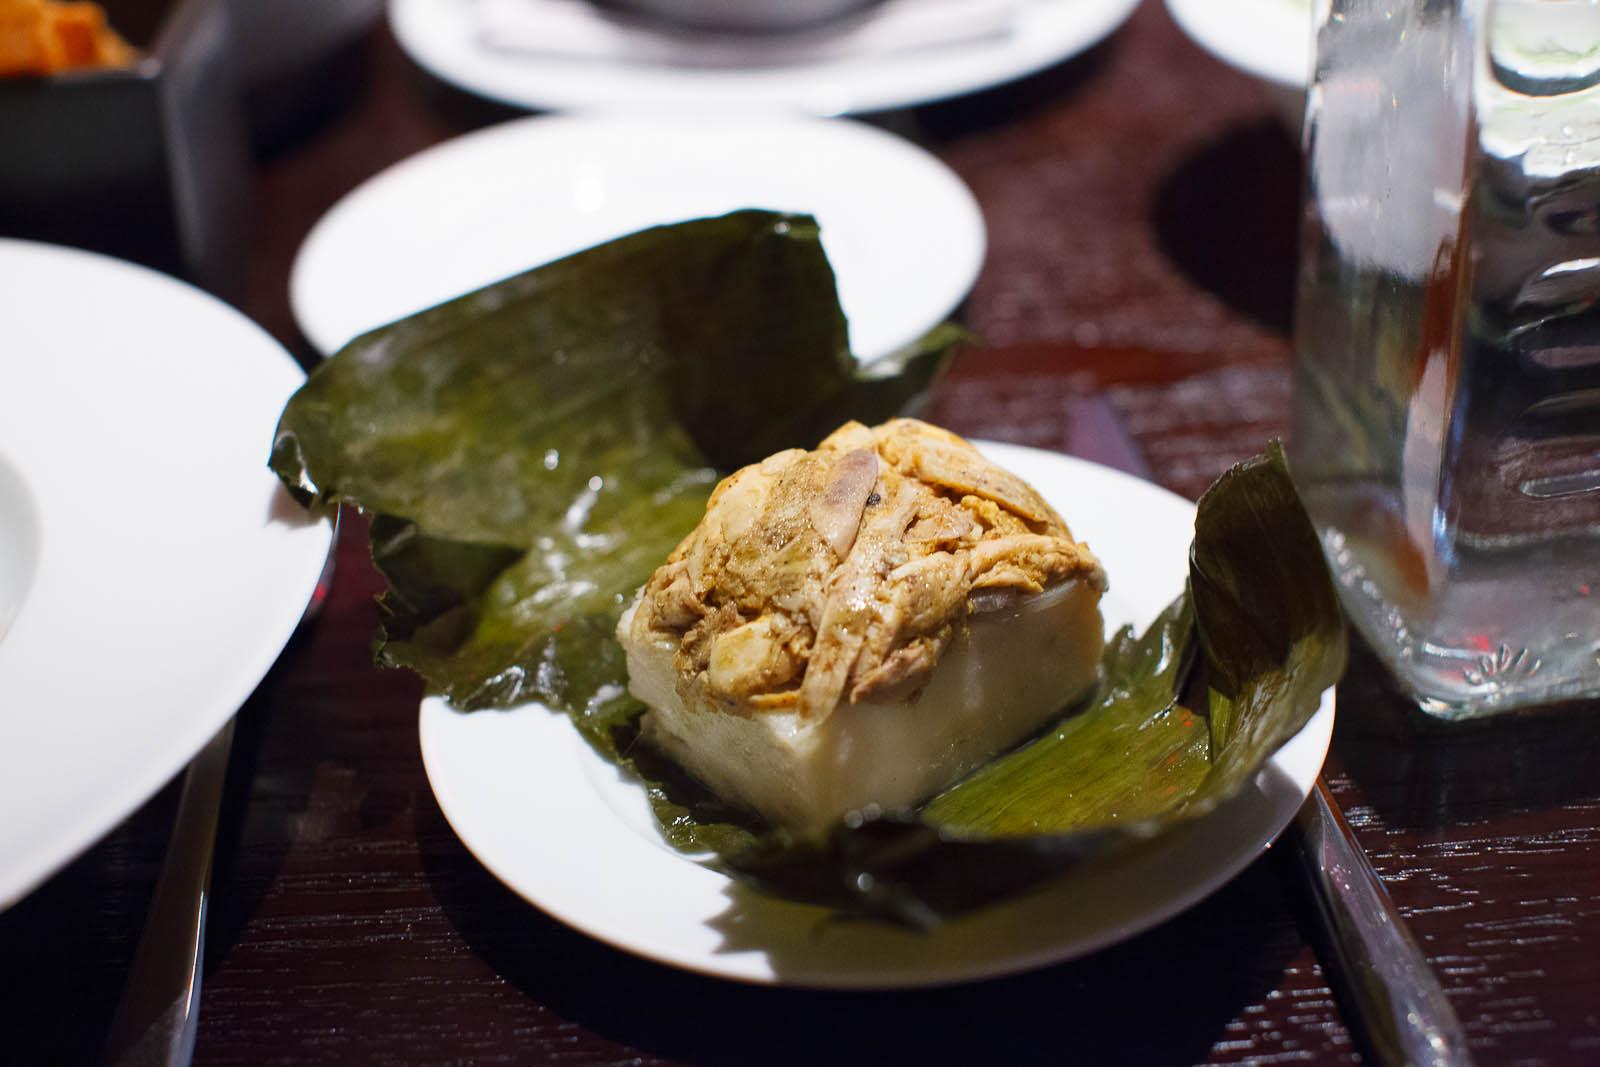 Tamal Colado (Yucatan style strained tamal, chicken, achiote) op